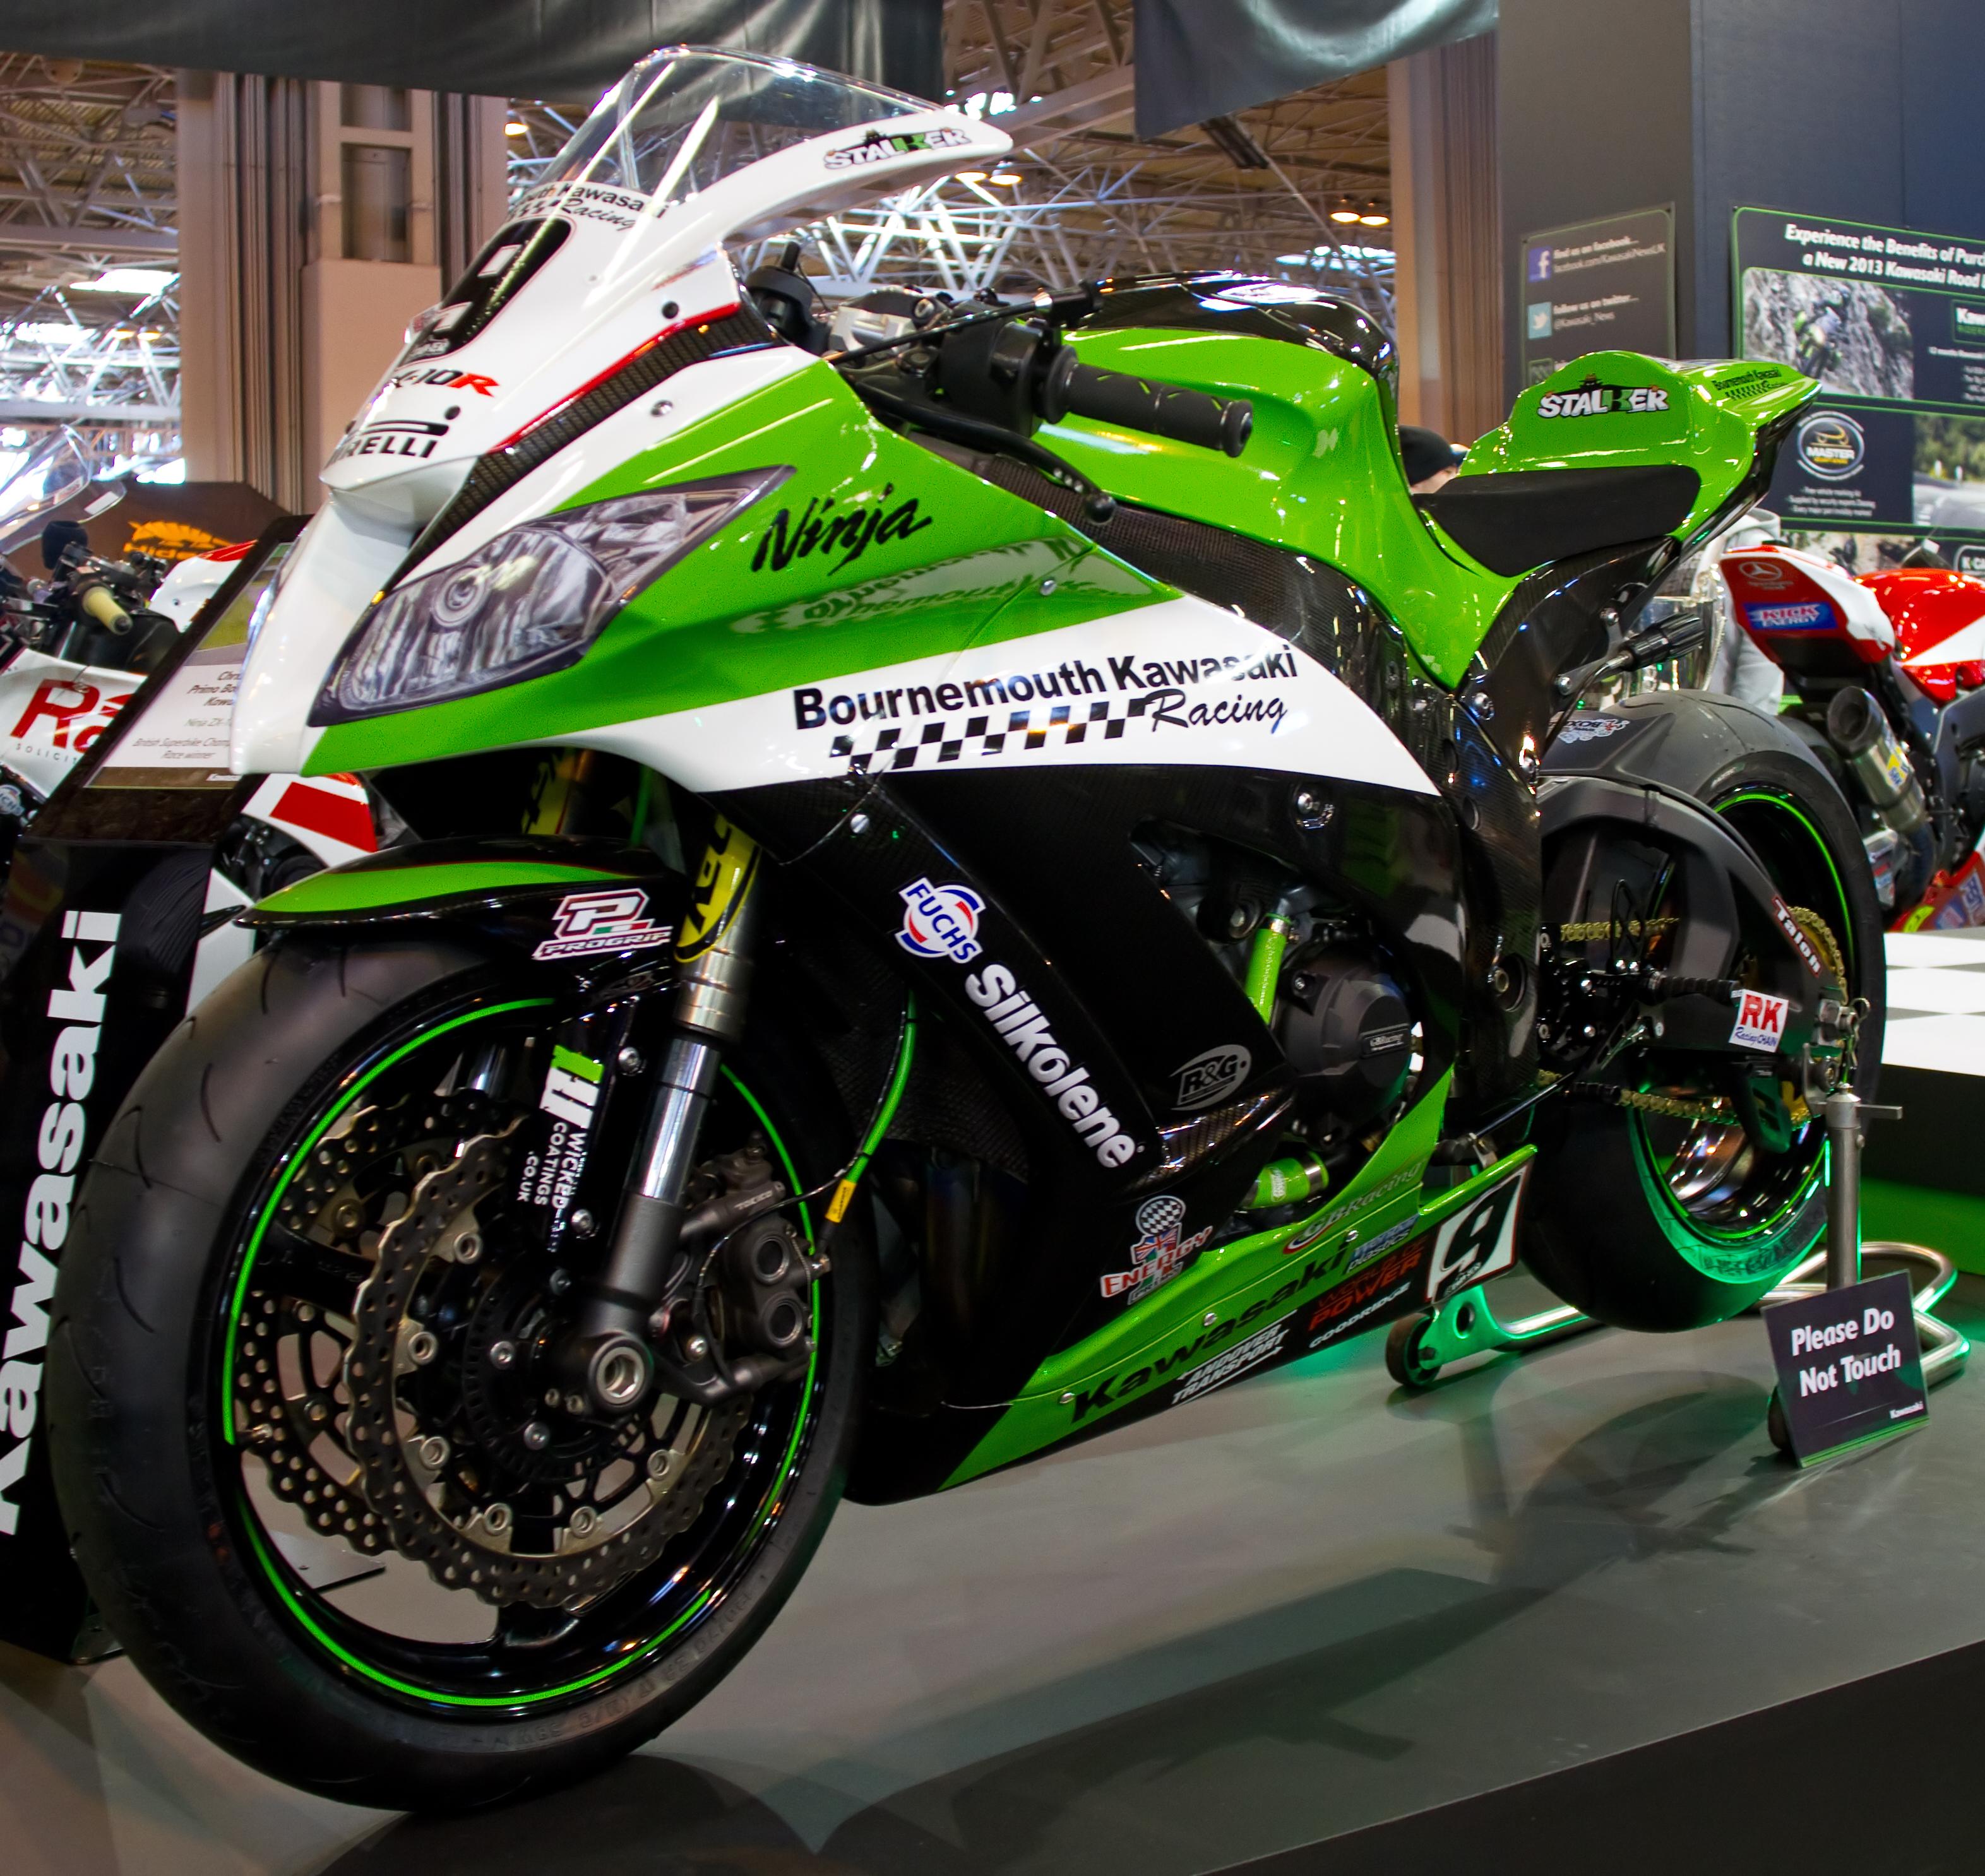 Nhung bo ao sac so cho Kawasaki ZX10R - 4